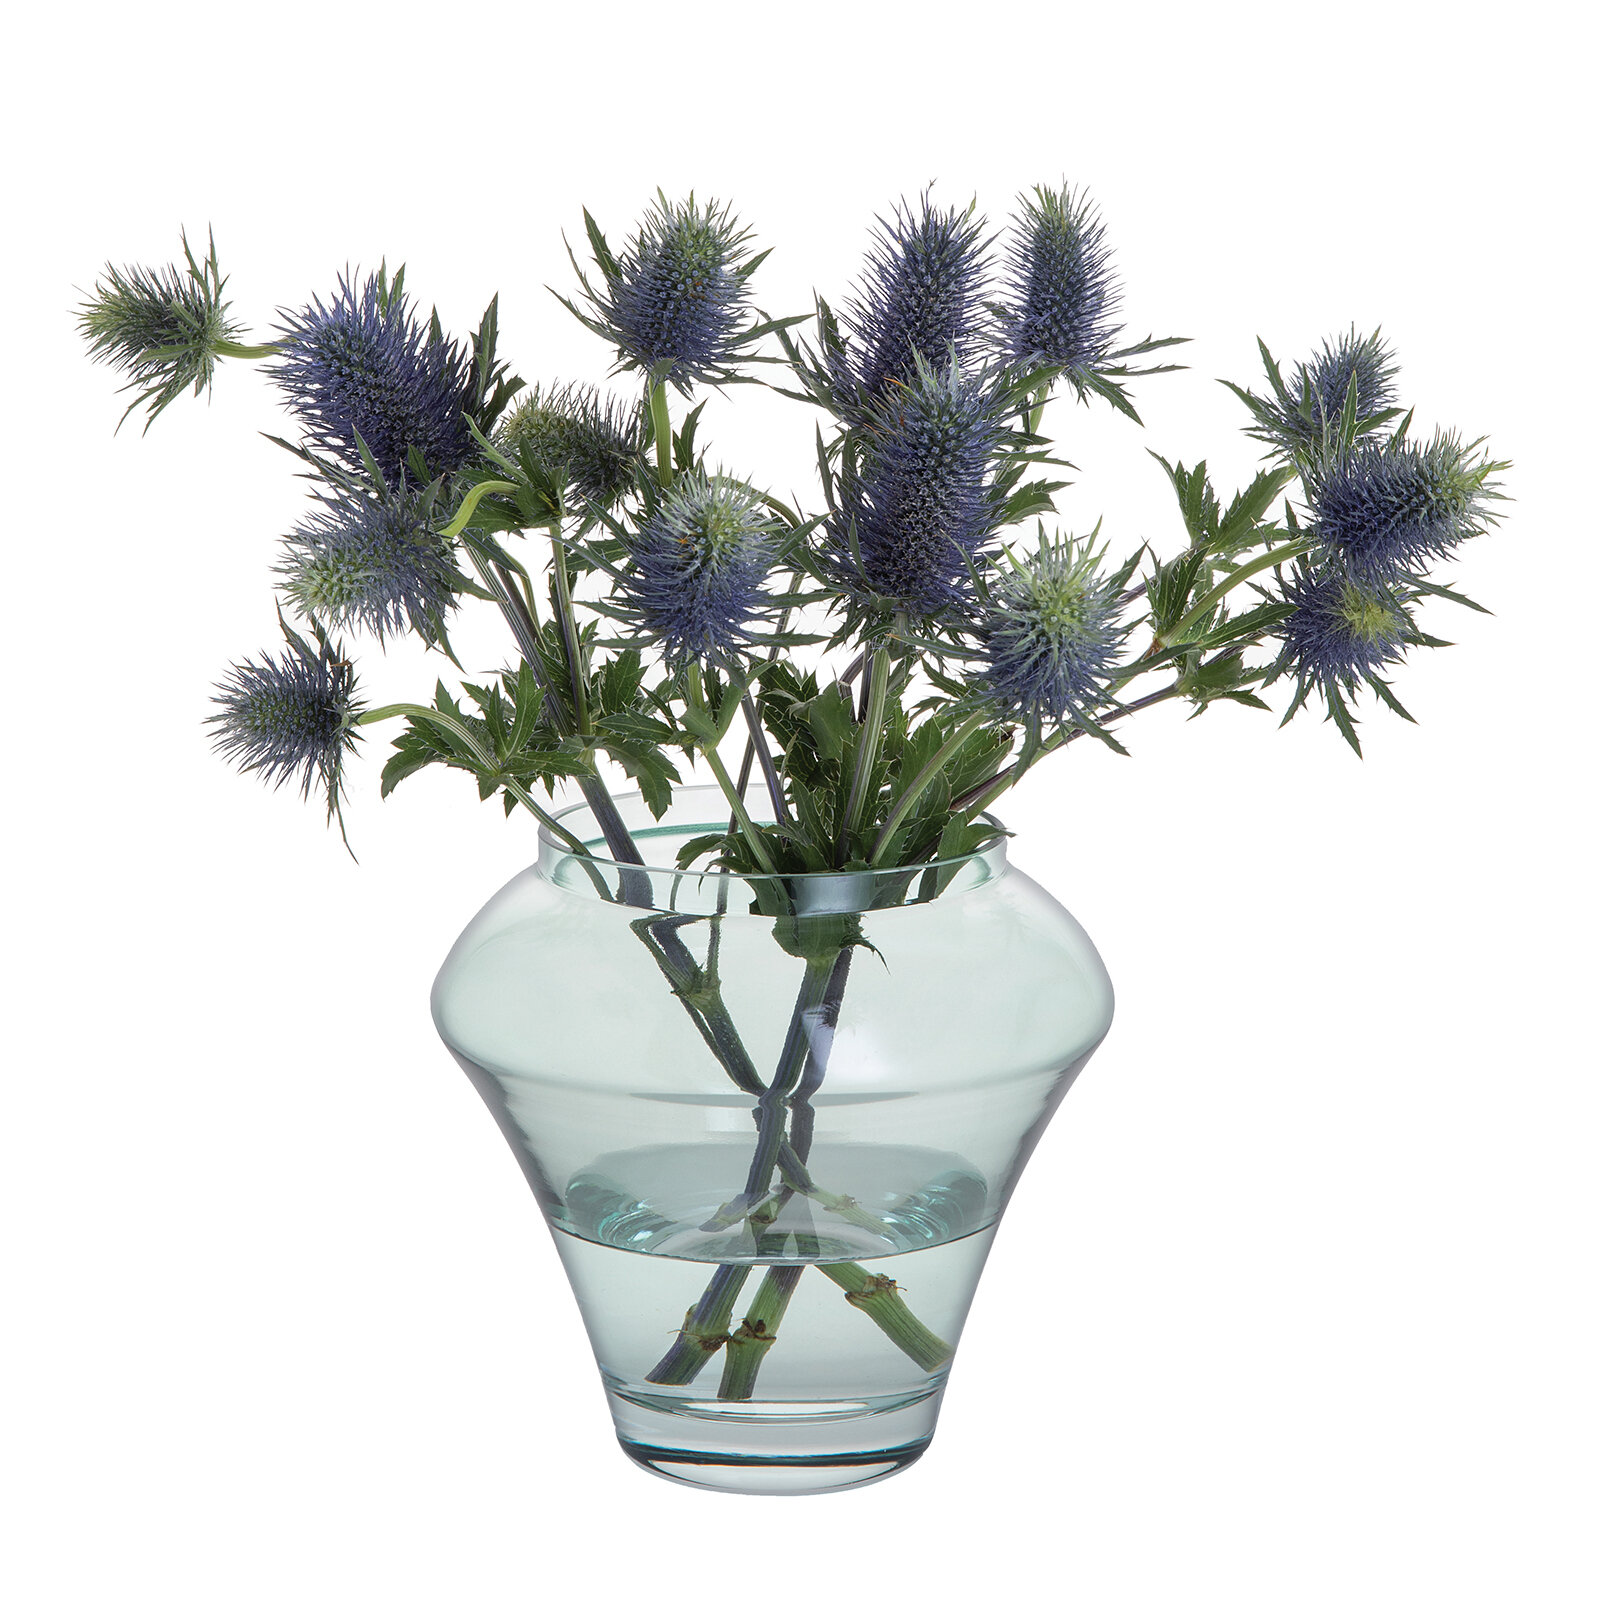 Dartington Crystal Deco Table Vase Wayfair Co Uk